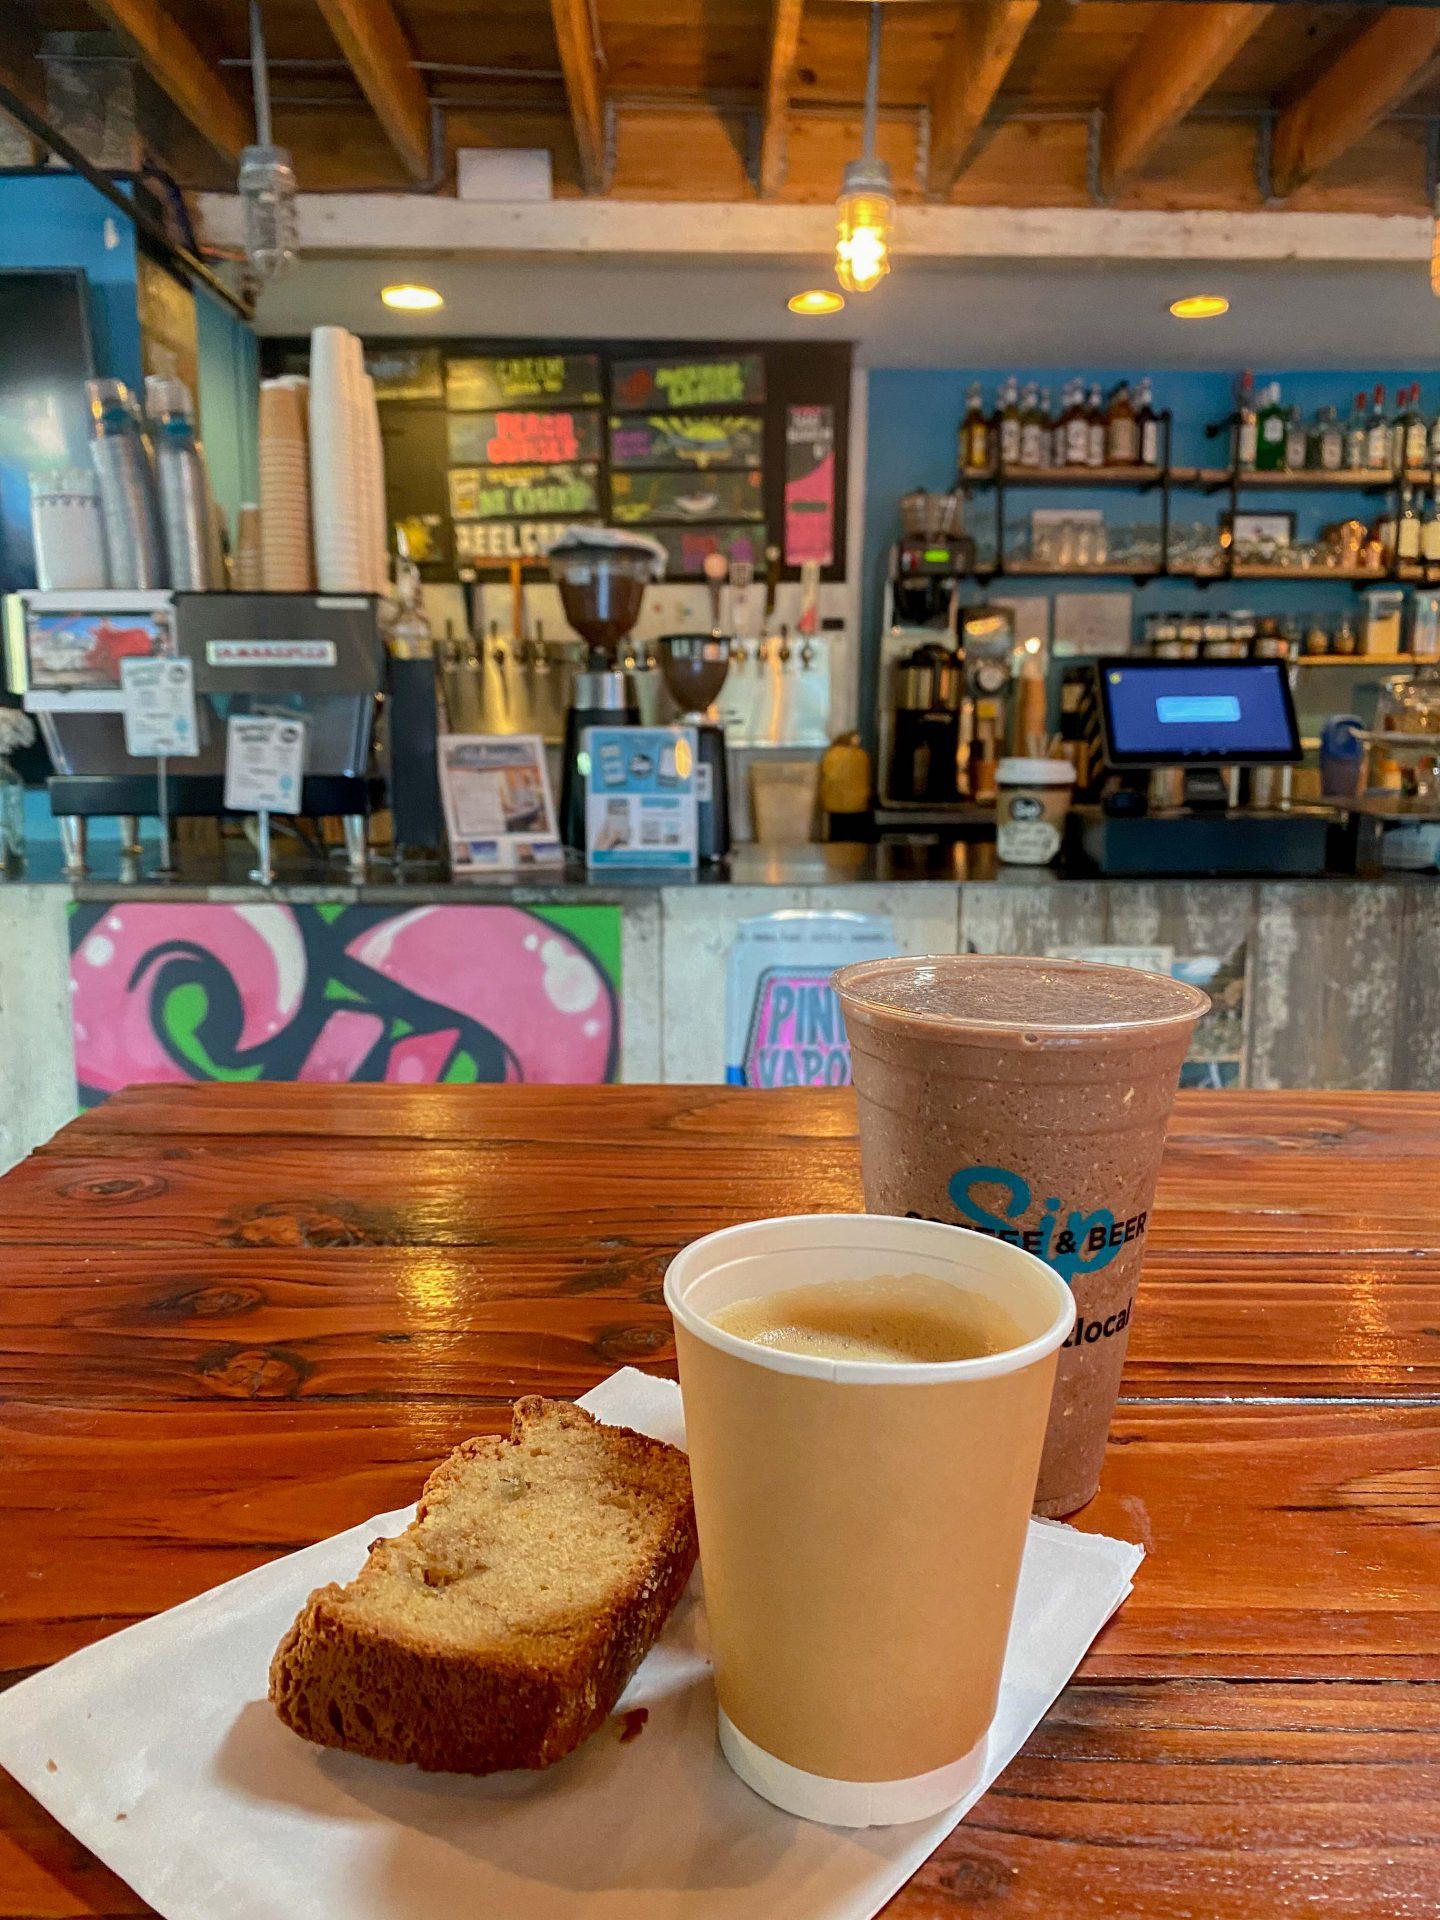 sip and beer, coffee shop, scottsdale Arizona, best coffee shops in scottsdale, Arizona Phoenix, travel blog, the best of, blog